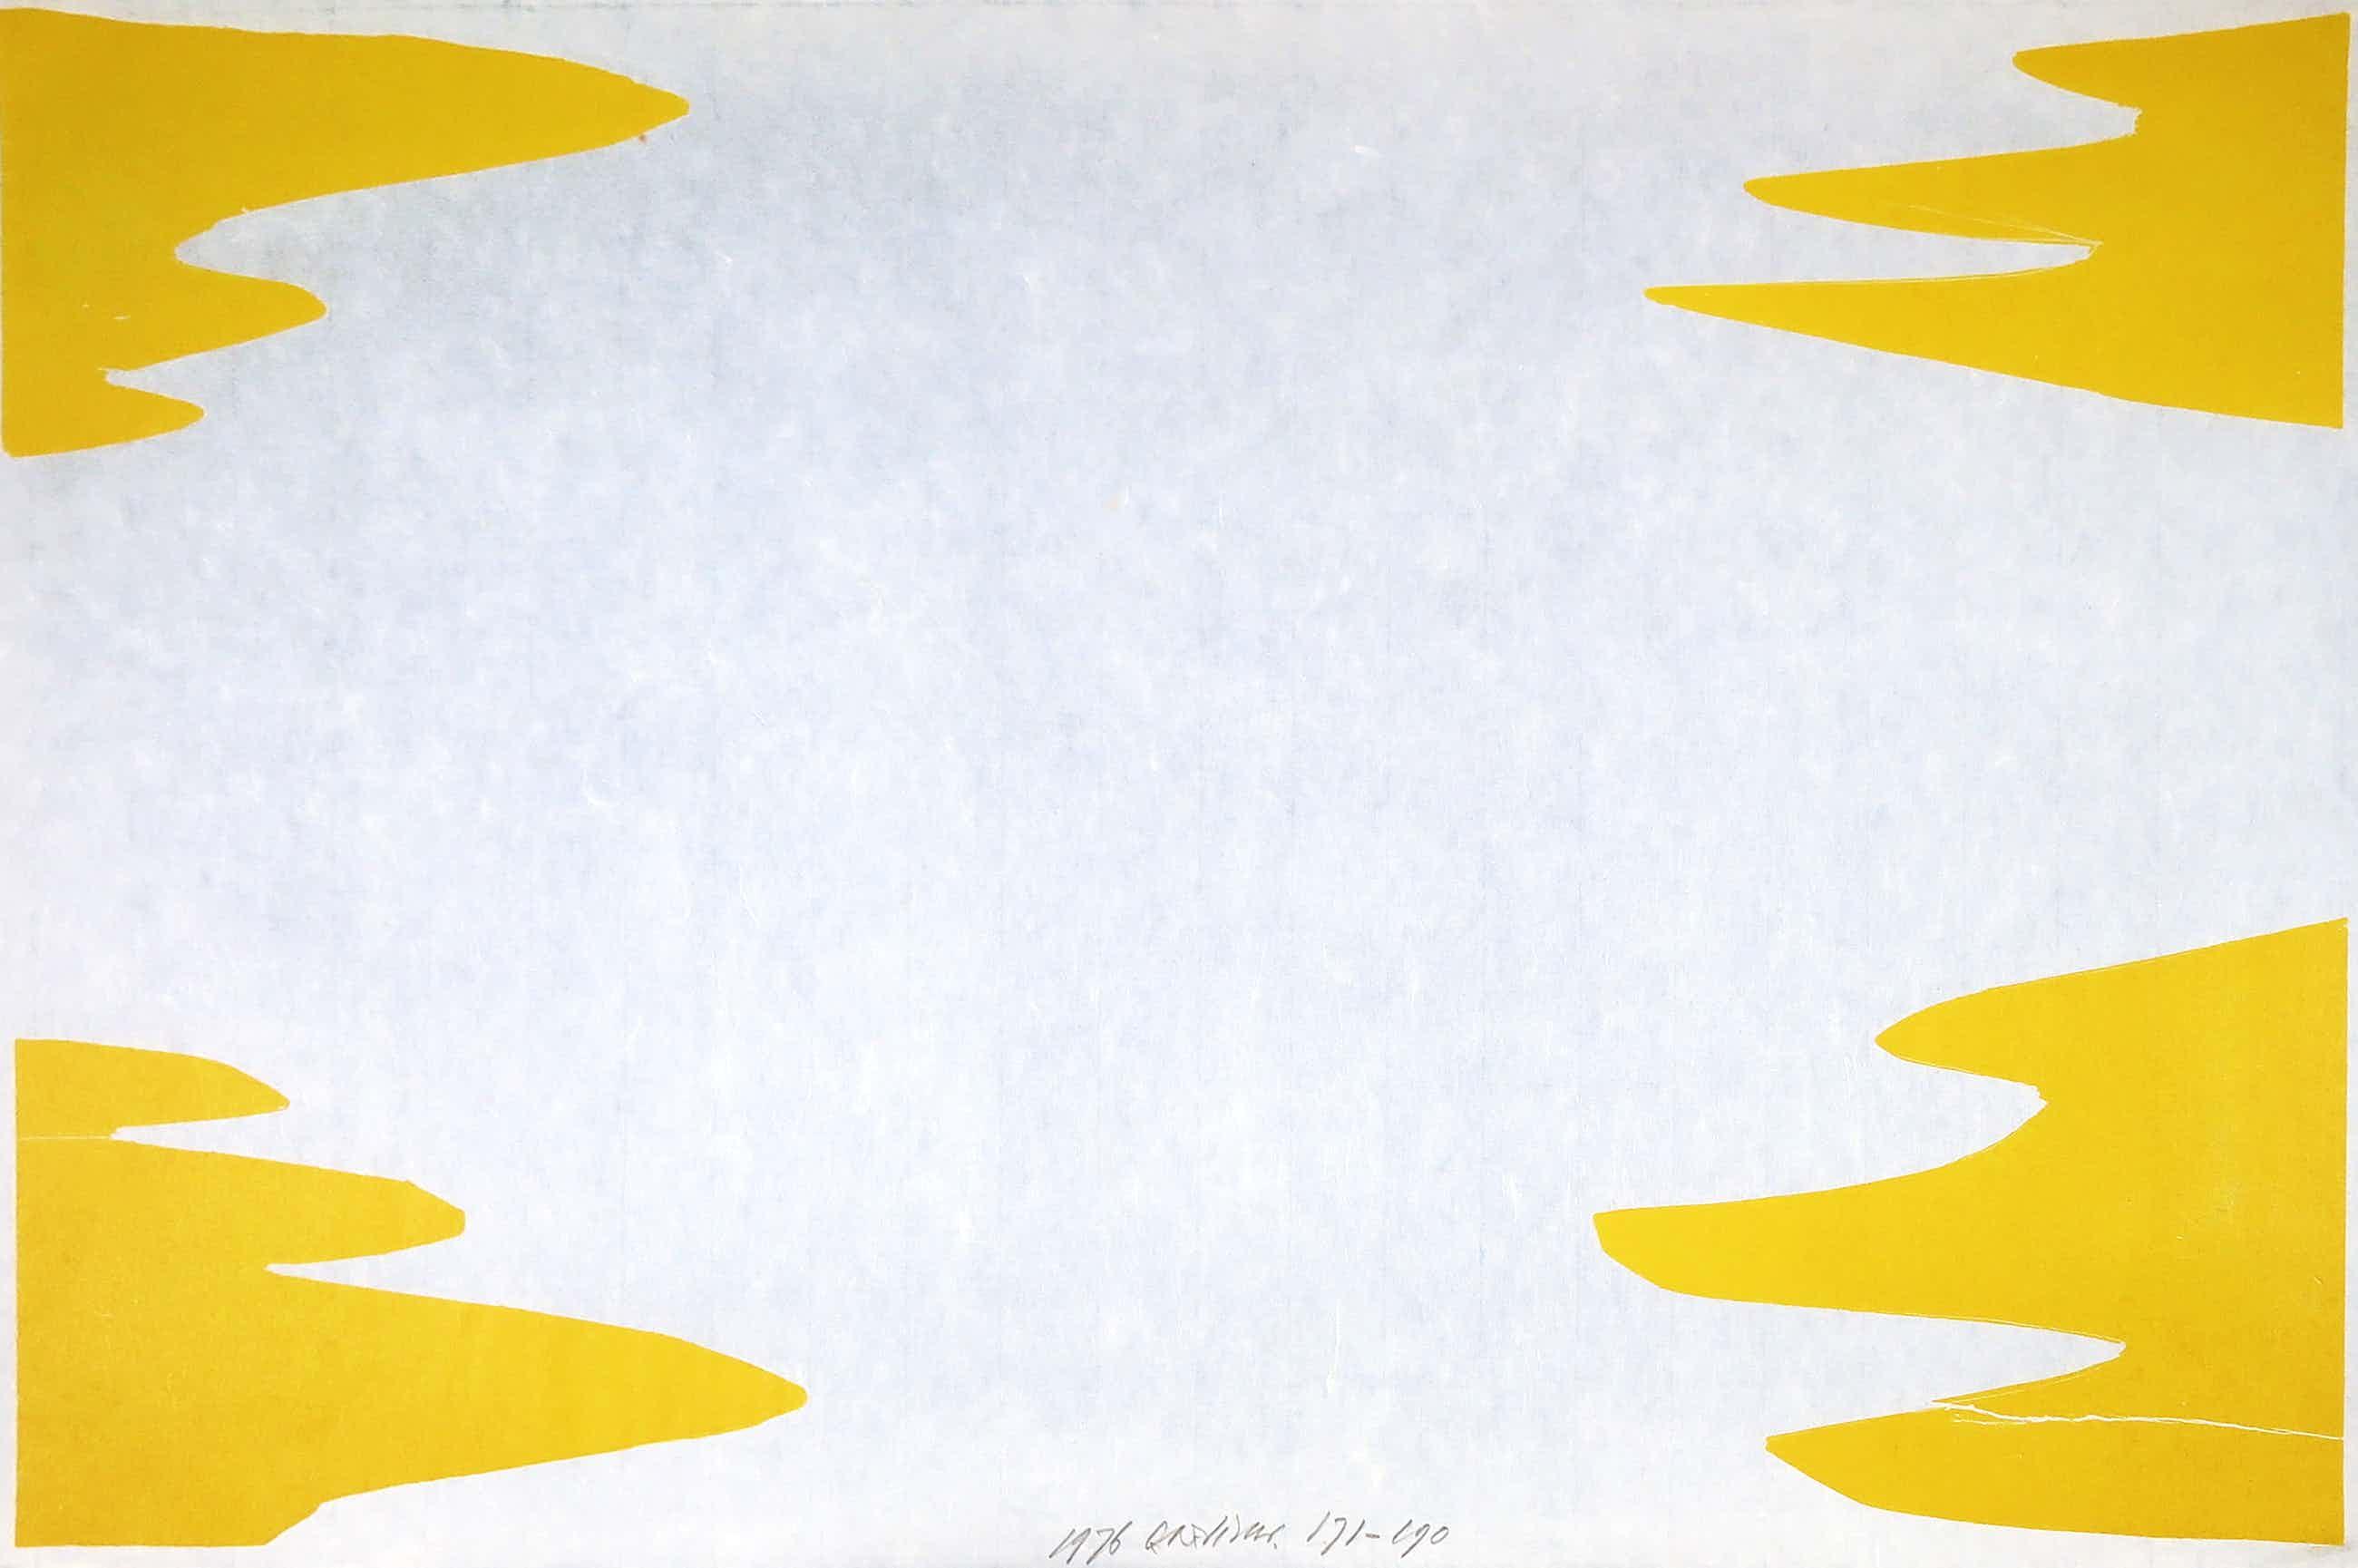 Carel Visser - Houtdruk op Japans papier, Prent 190 kopen? Bied vanaf 100!